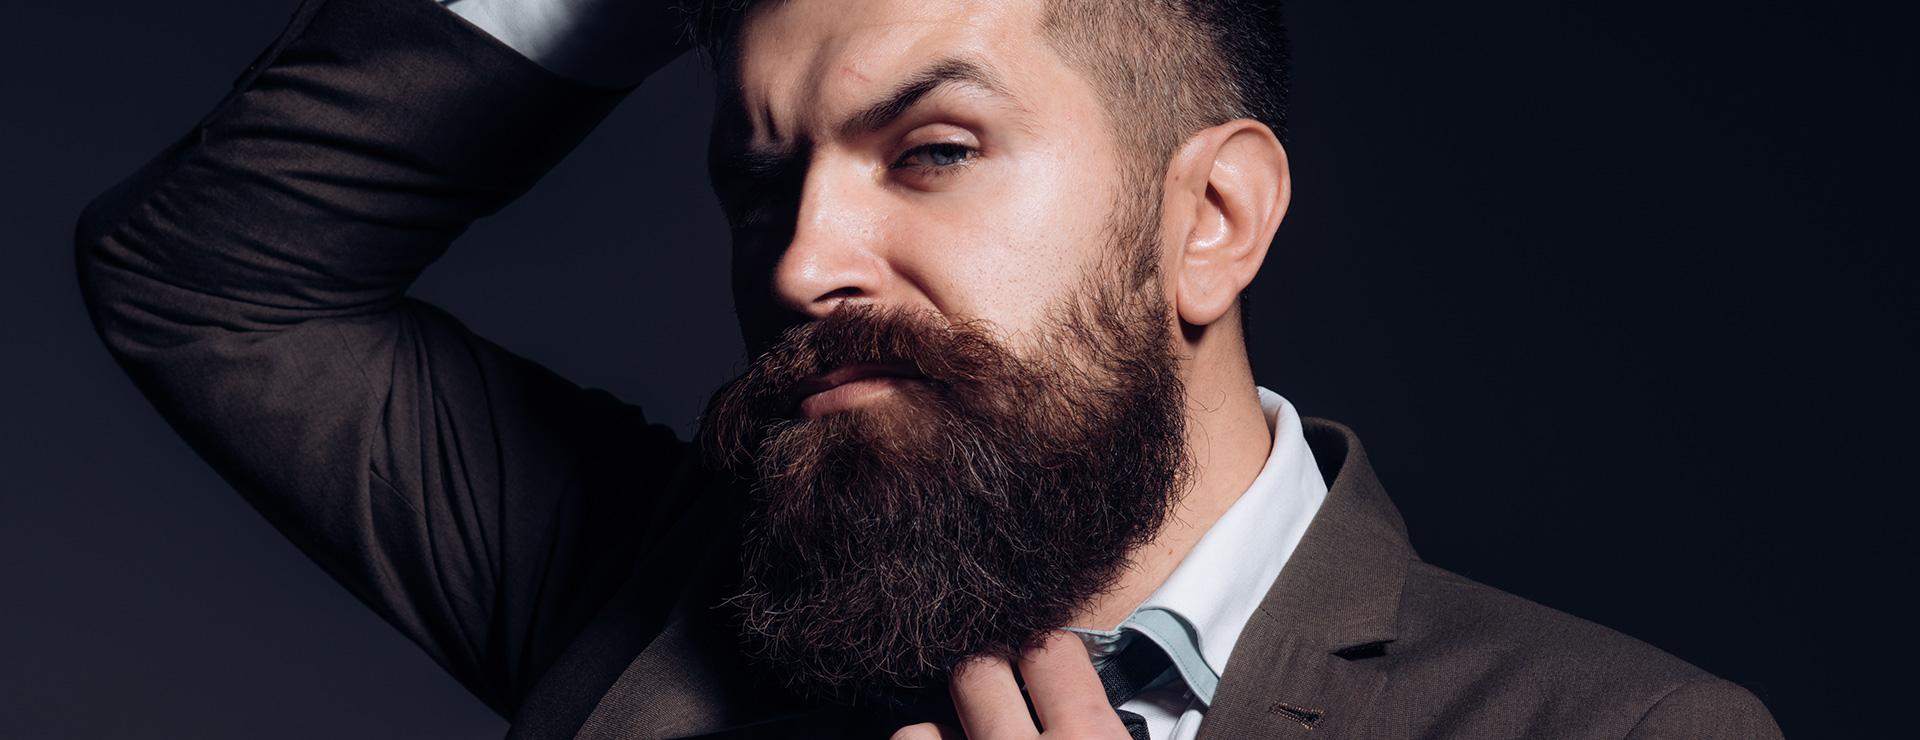 Max coiffure Barbier à Dijon